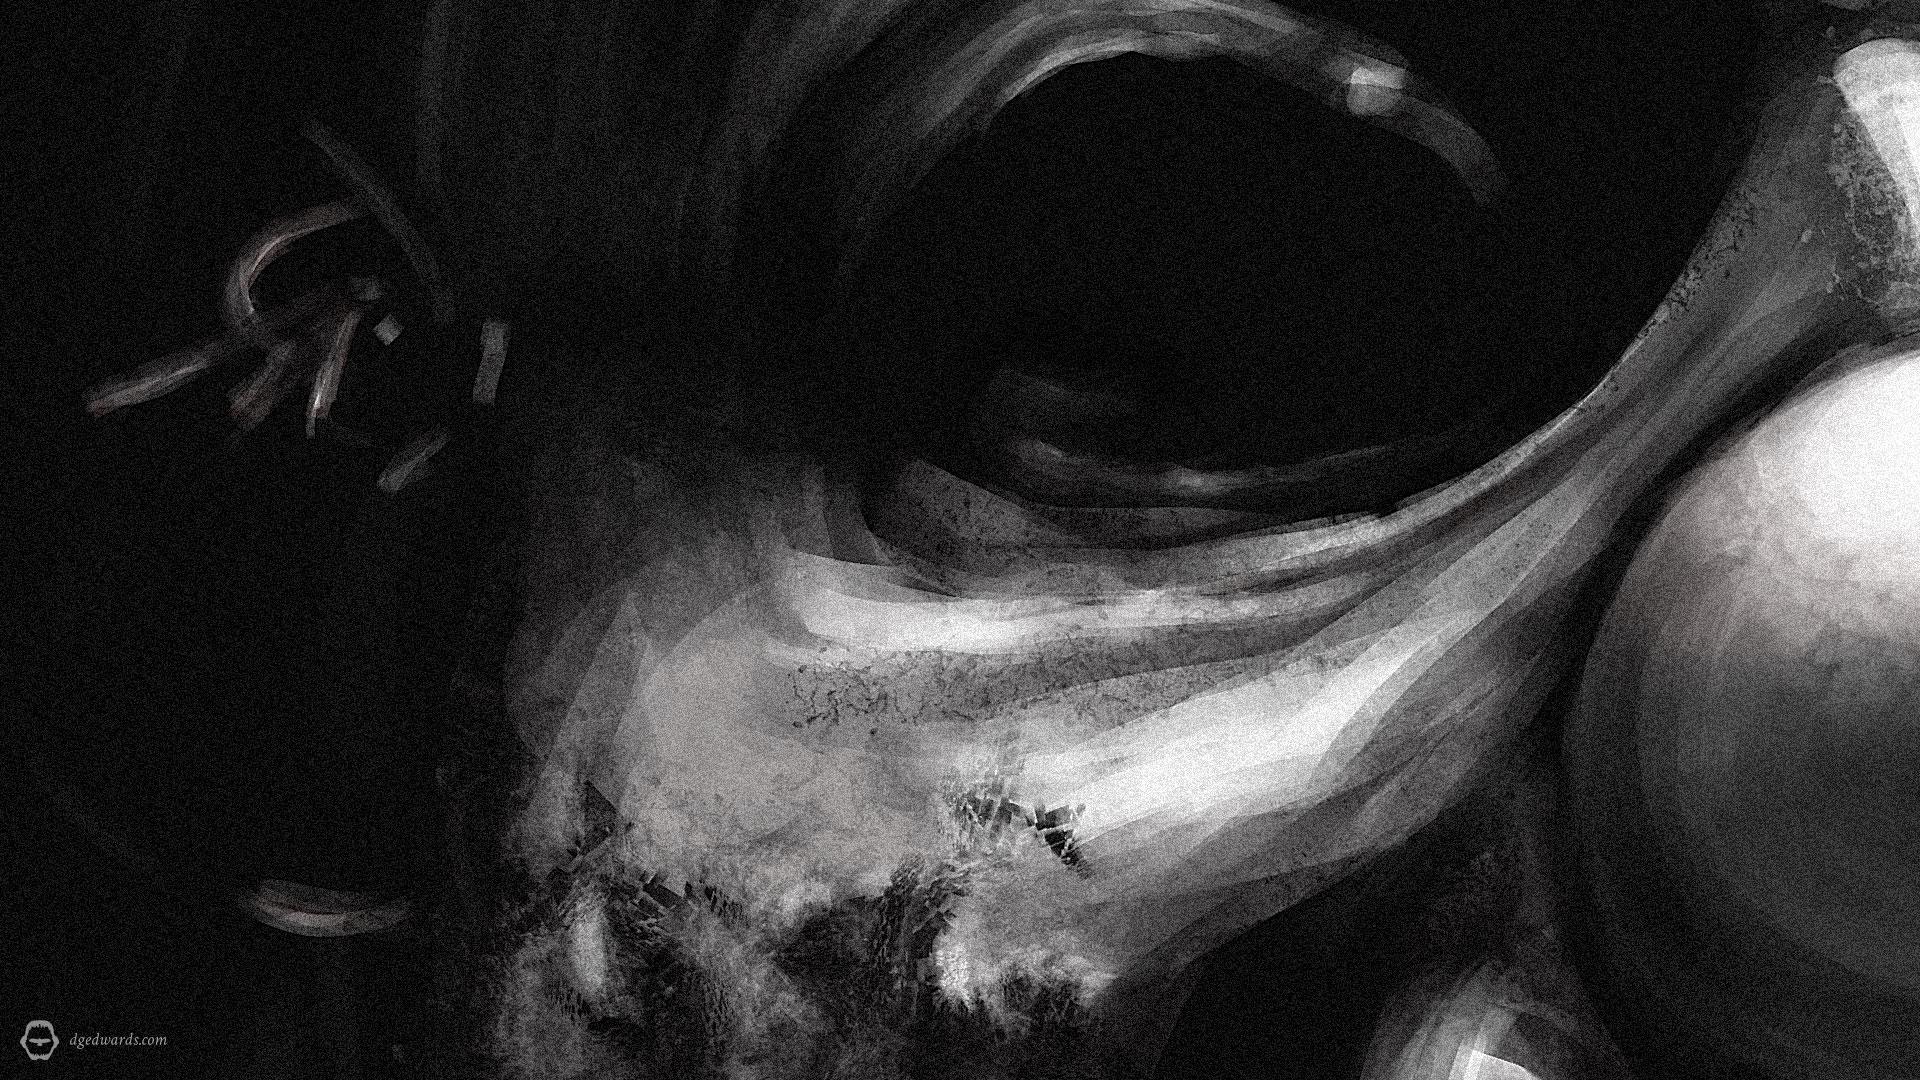 Shawn 'Clown' Crahan, Slipknot percussionist illustration